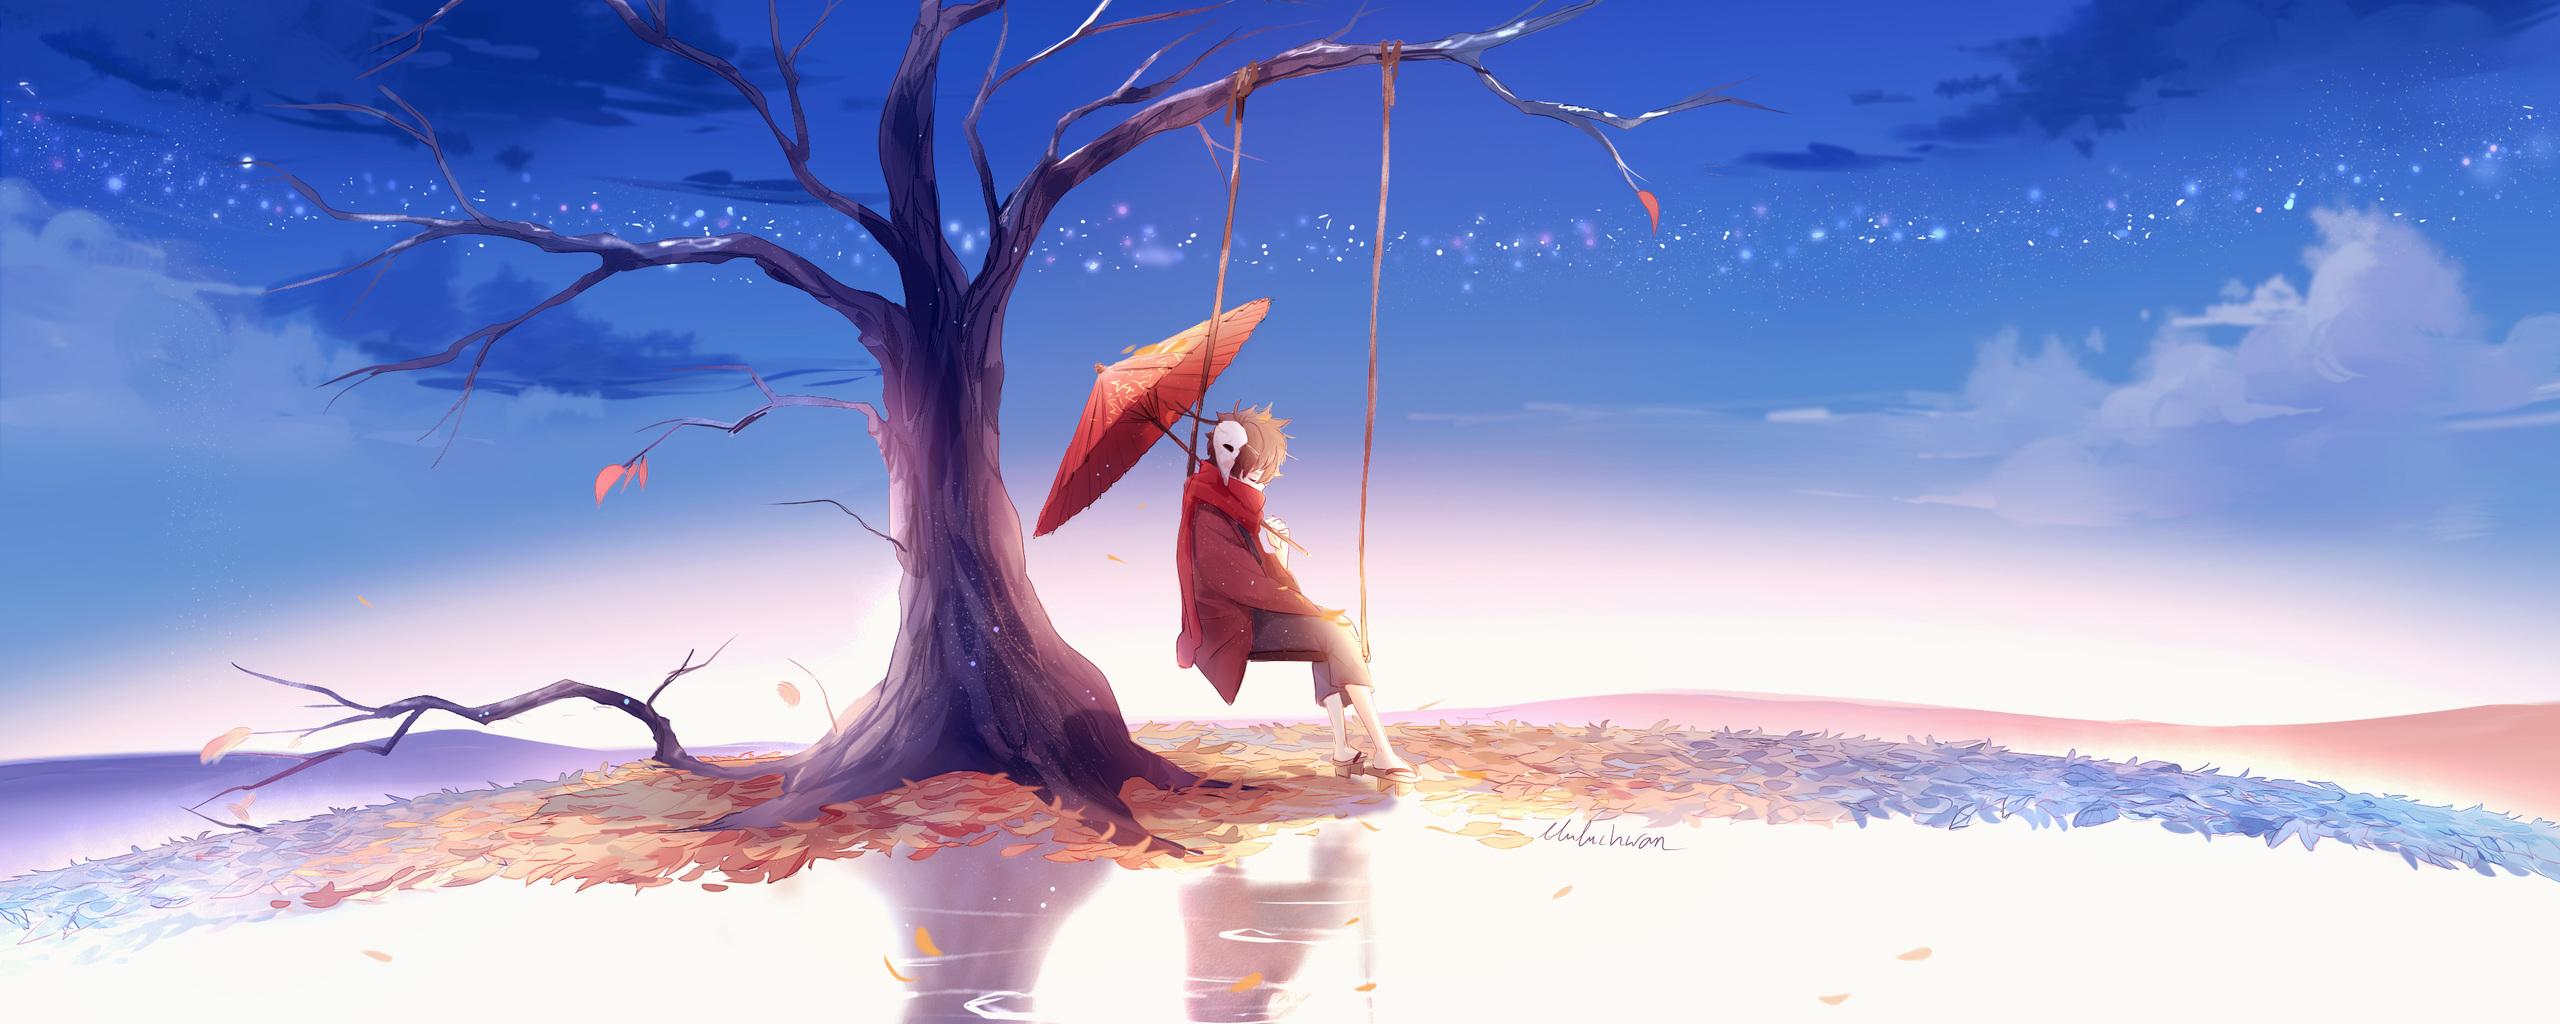 anime-boy-swing-umbrella-4k-gc.jpg